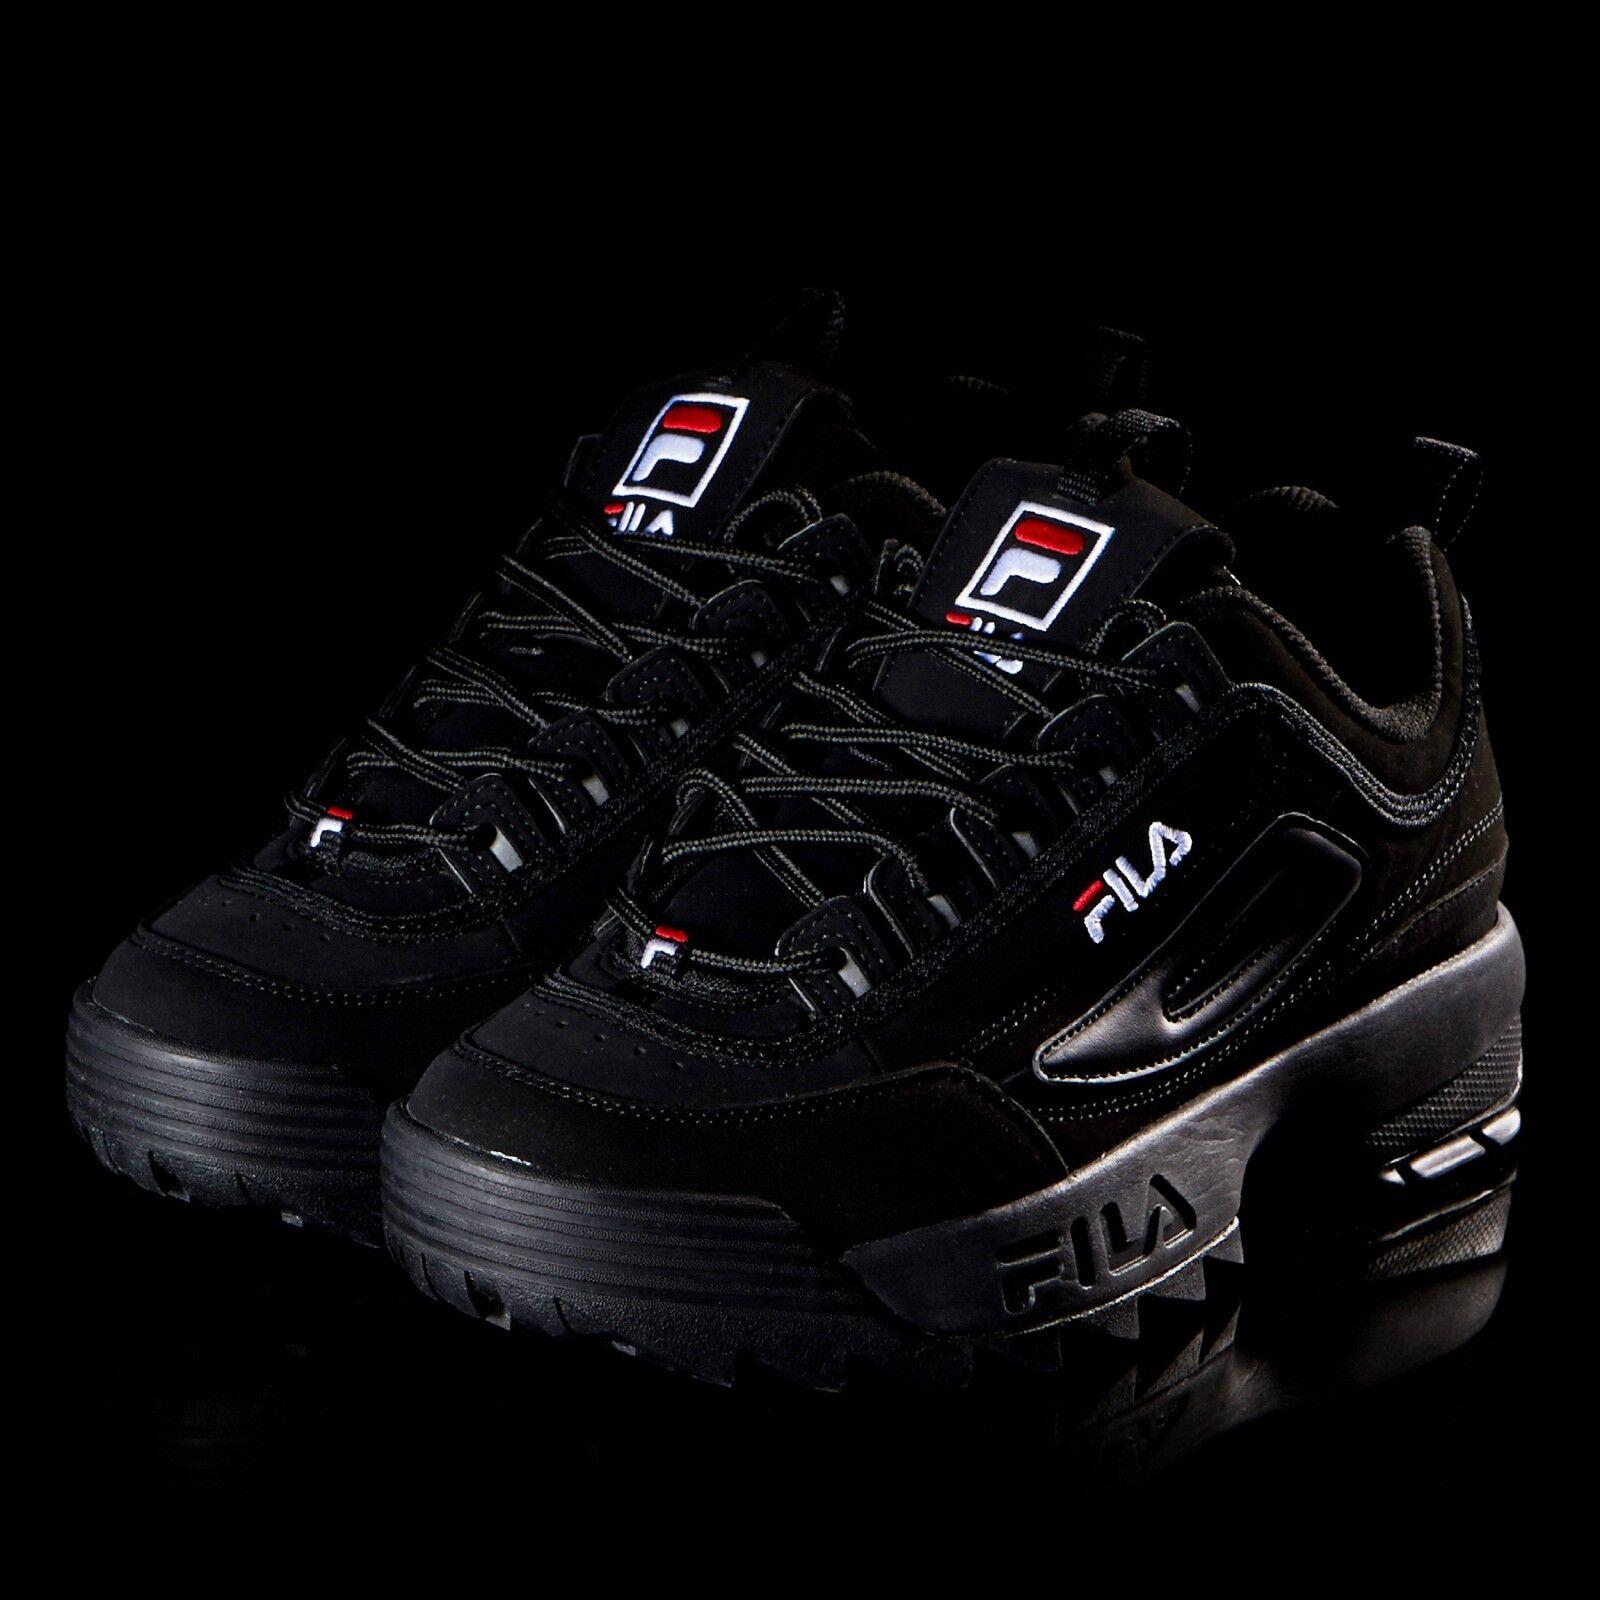 2018 FILA Disruptor II 2 Triple Black Shoes Unisex Comfortable Great discount